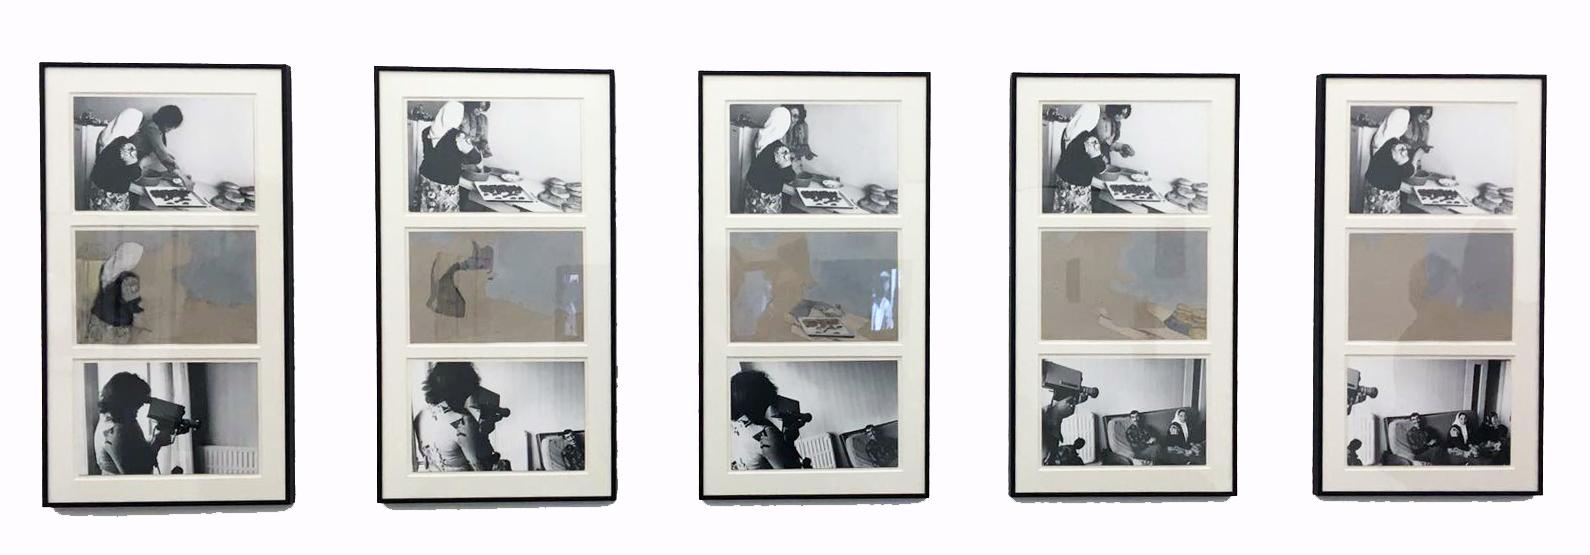 Nil Yalter,  Le Musée Absent , WIELS, vue d'exposition.